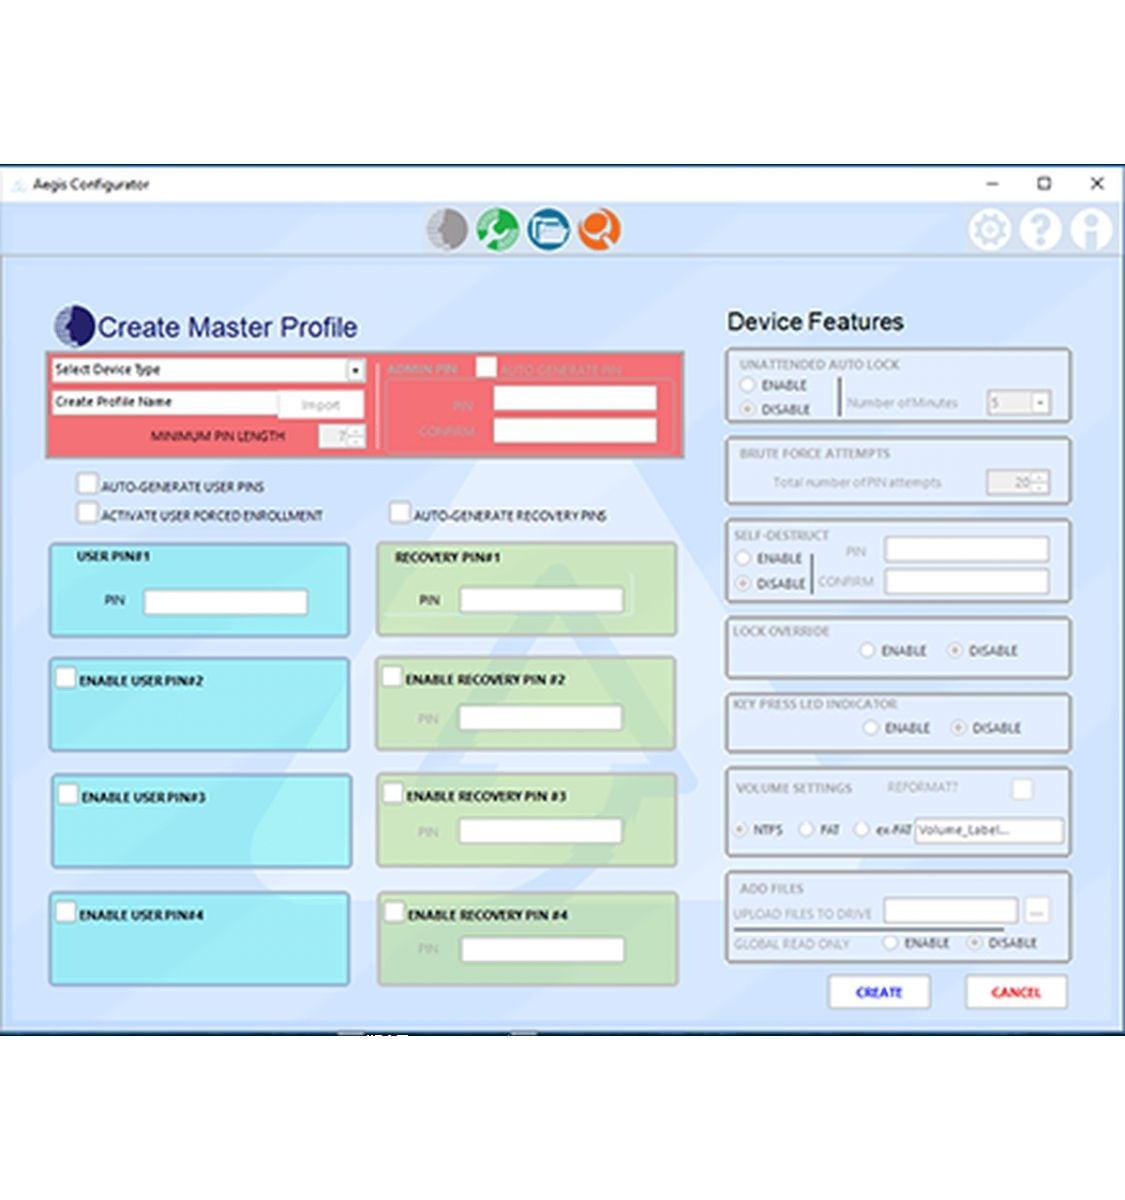 apricorn configurator centrale provisioning tool